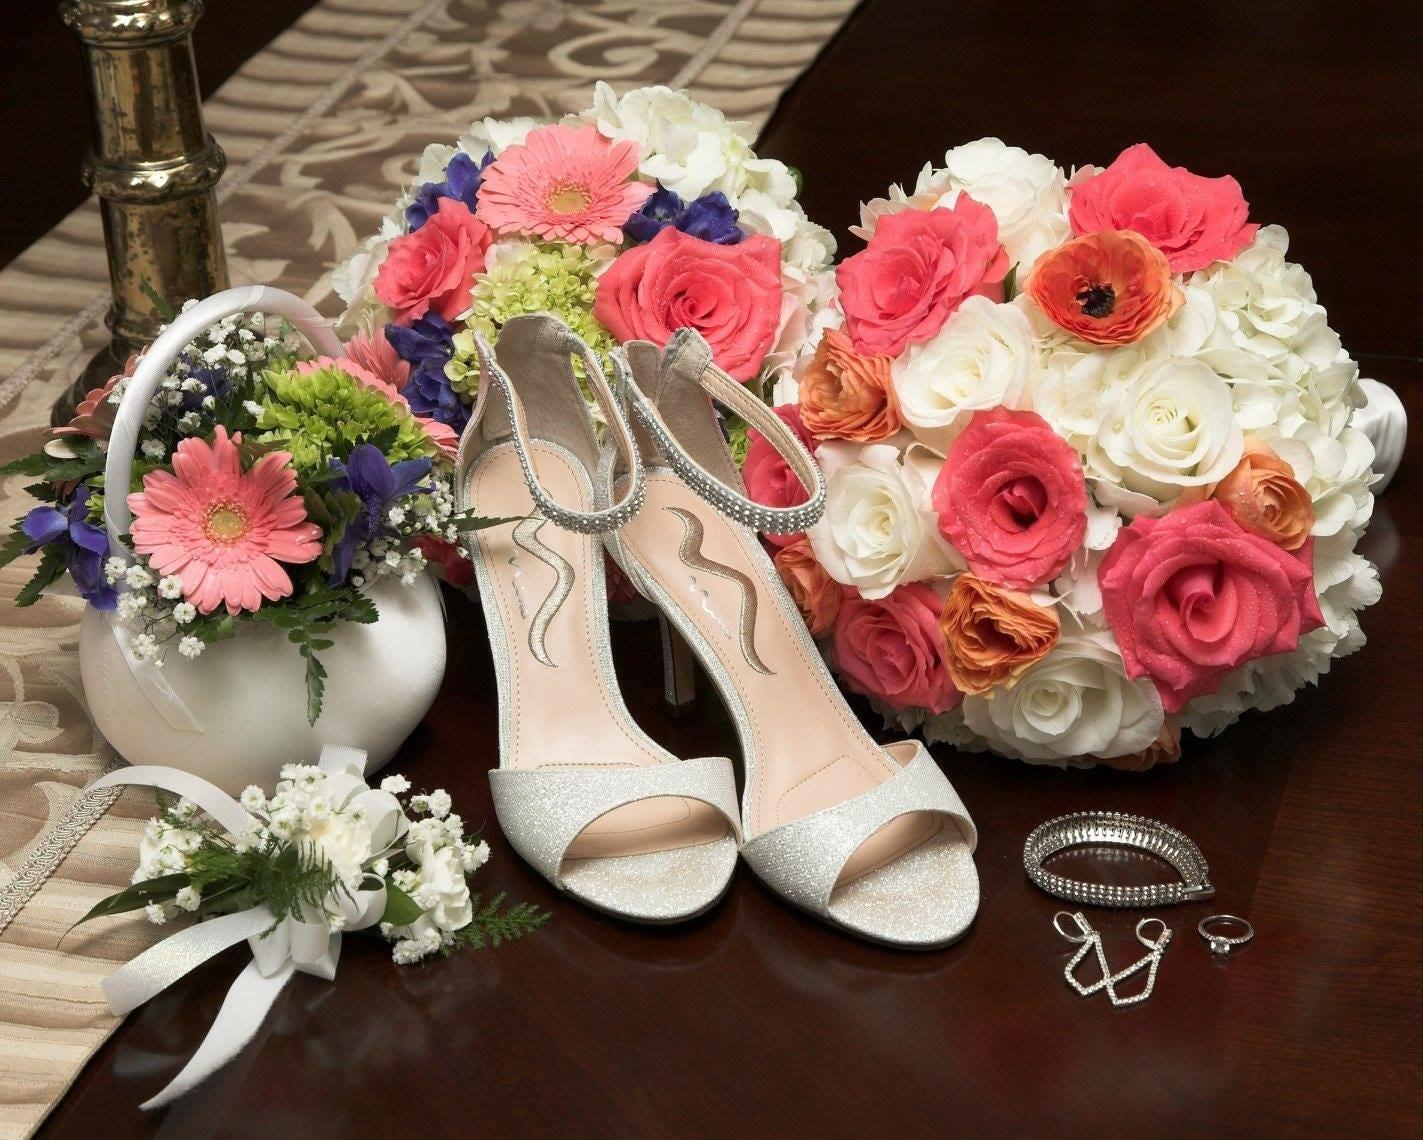 Wedding Flower Gallery Moles Flower Gift Shop In Norristown